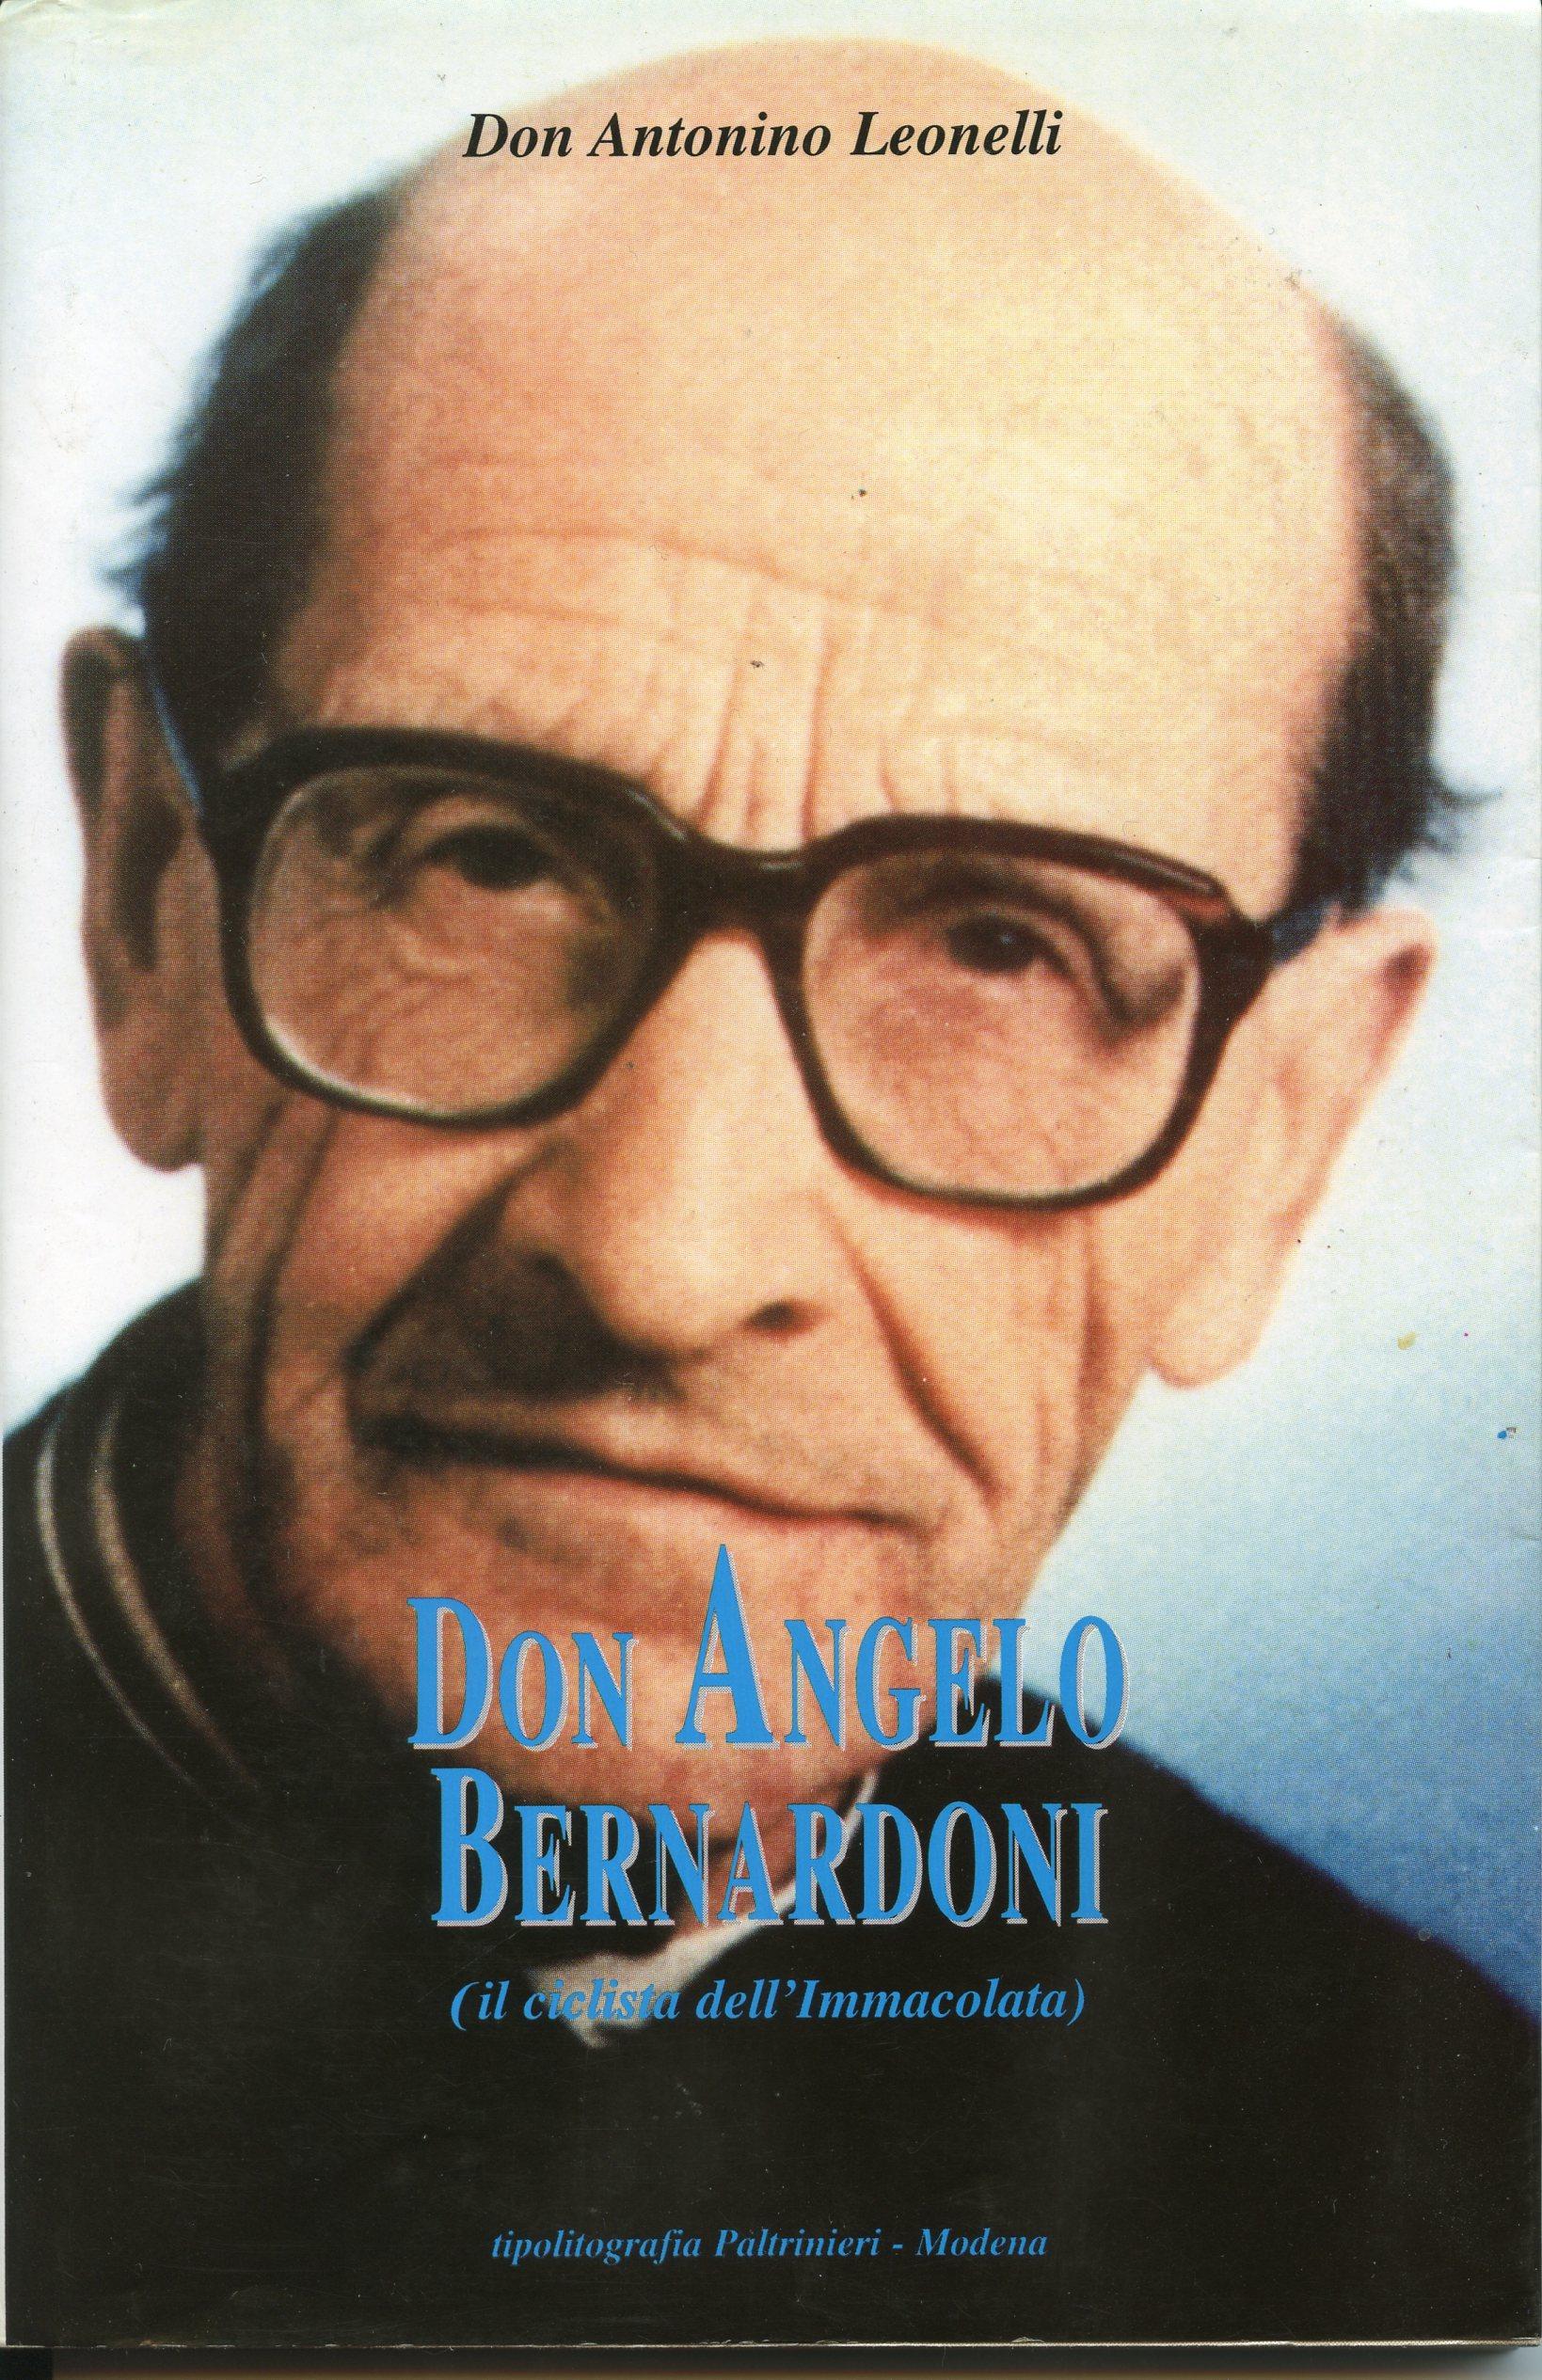 Don Angelo Bernardoni